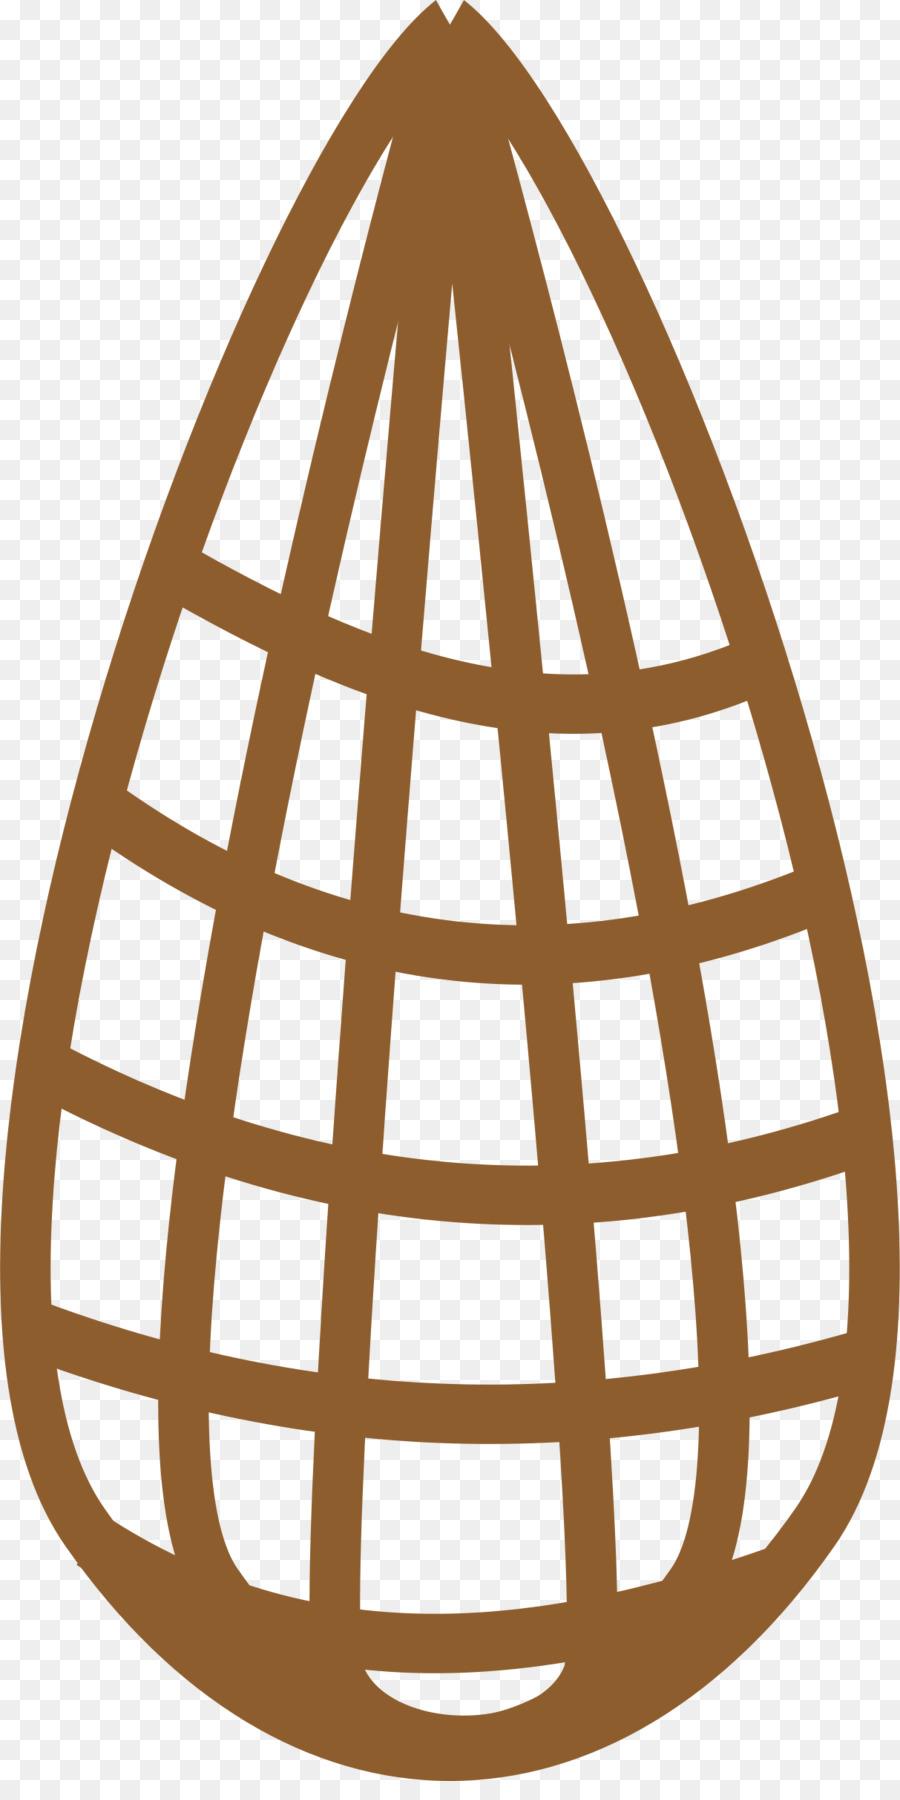 kisspng fishing nets fisherman clip art fishing net cliparts 5ab1b9ac13fa77.4106704715215968440818